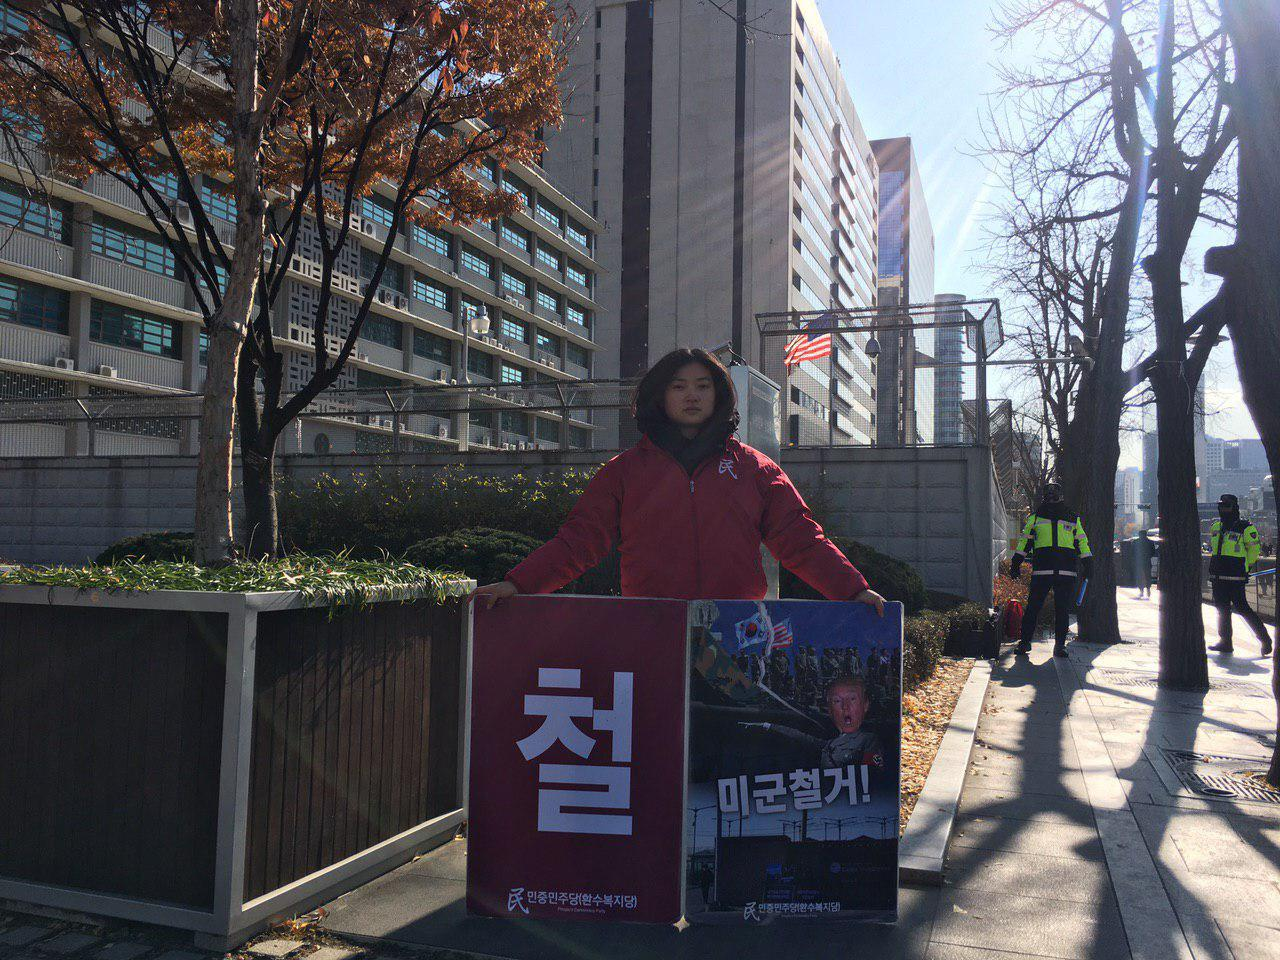 photo_2019-12-02_10-44-26.jpg